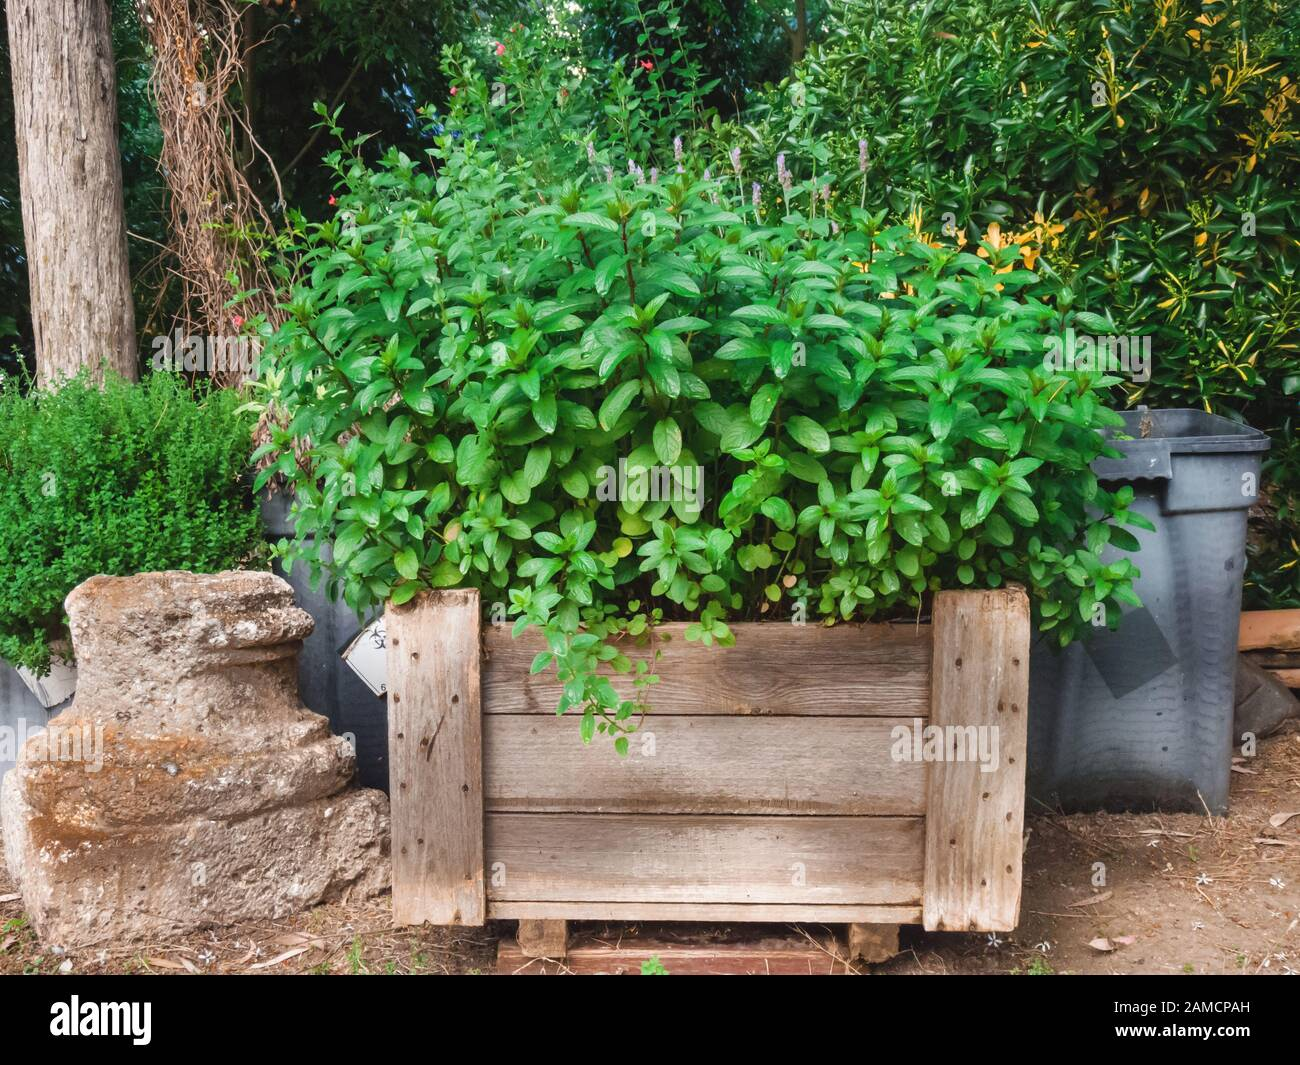 Plant De Menthe En Pot mentha spicata pot stock photos & mentha spicata pot stock